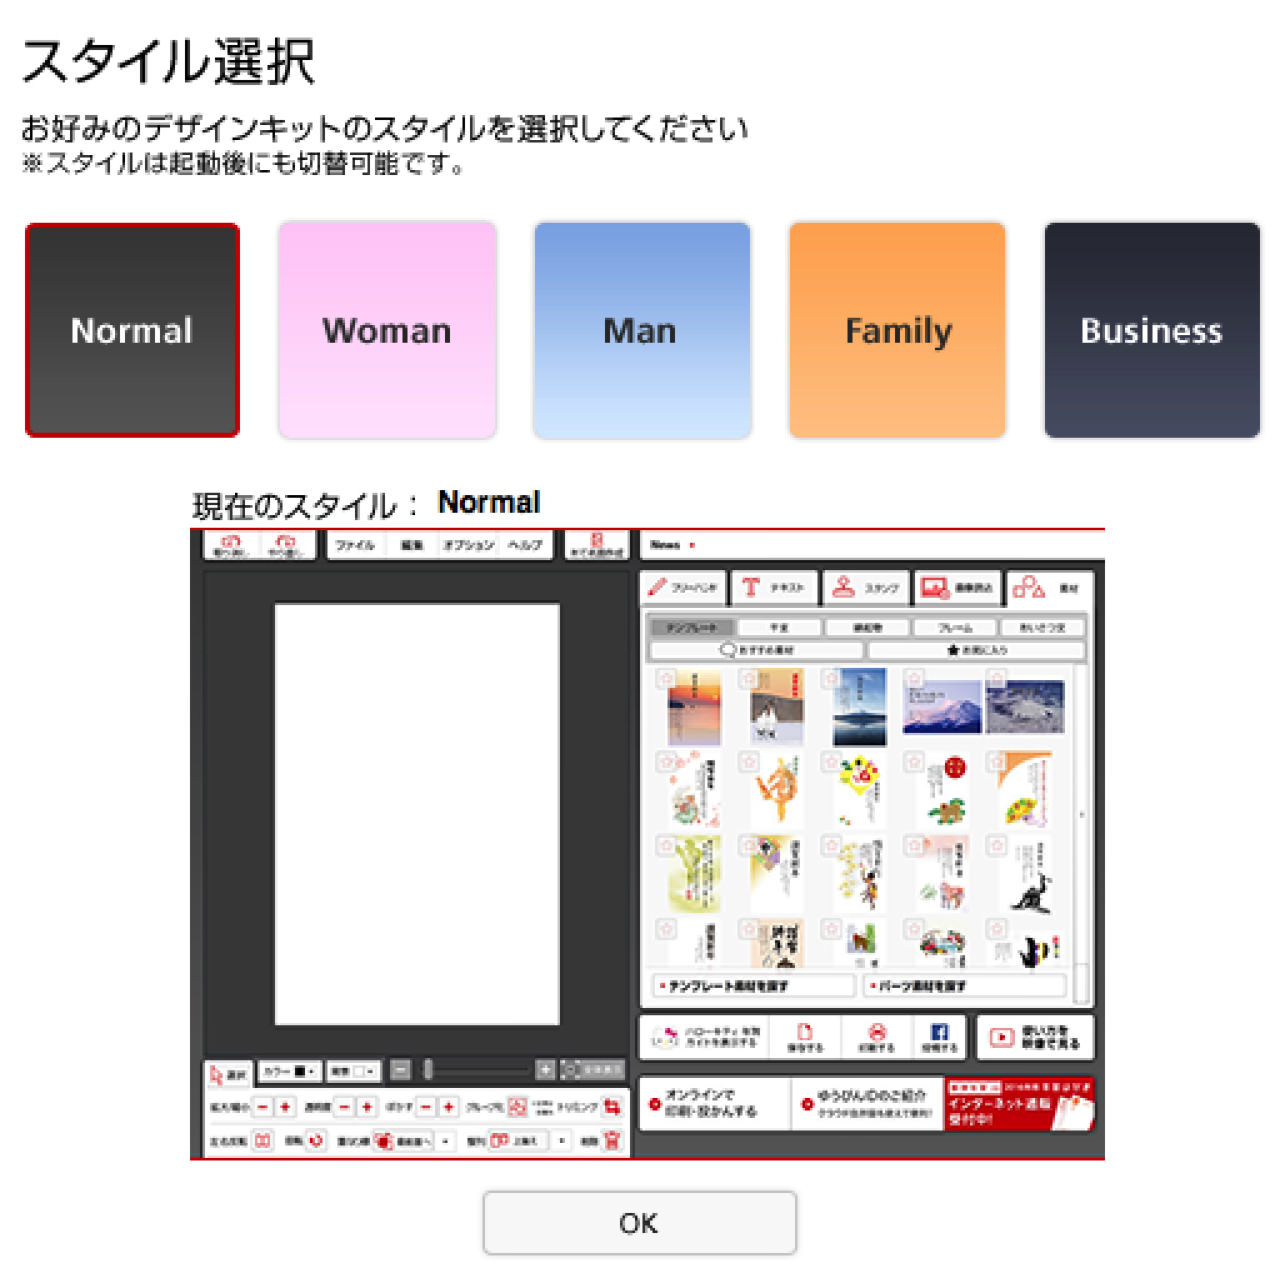 Hagaki design kit 201614